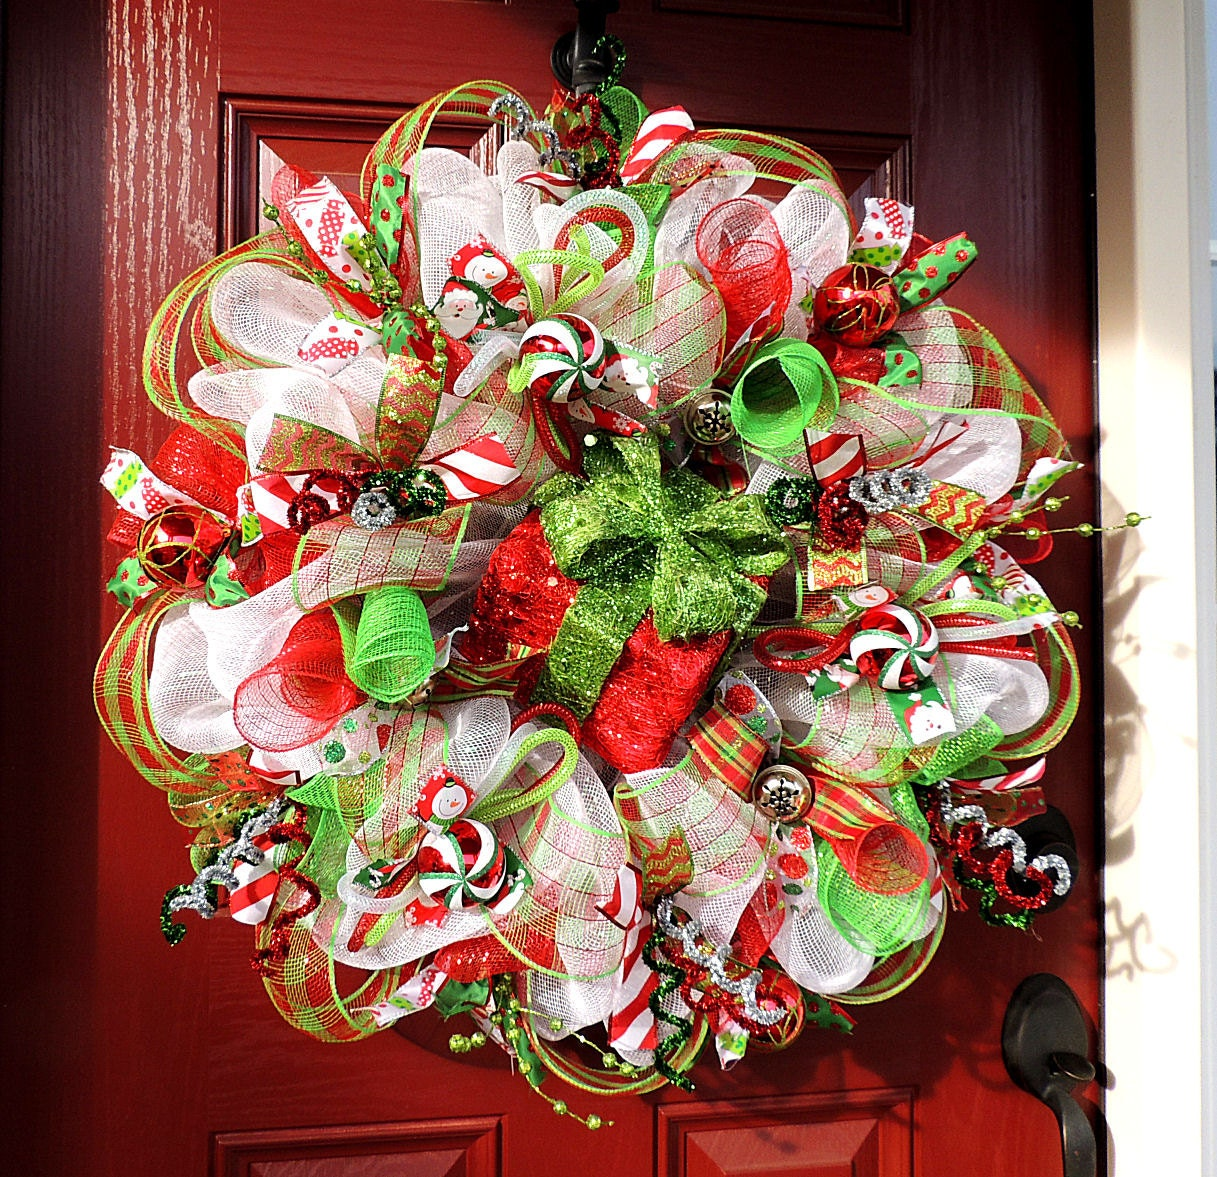 Deco Mesh Christmas Tree Wreath: Lighted Christmas Deco Mesh Wreath Deco Mesh Christmas Wreath